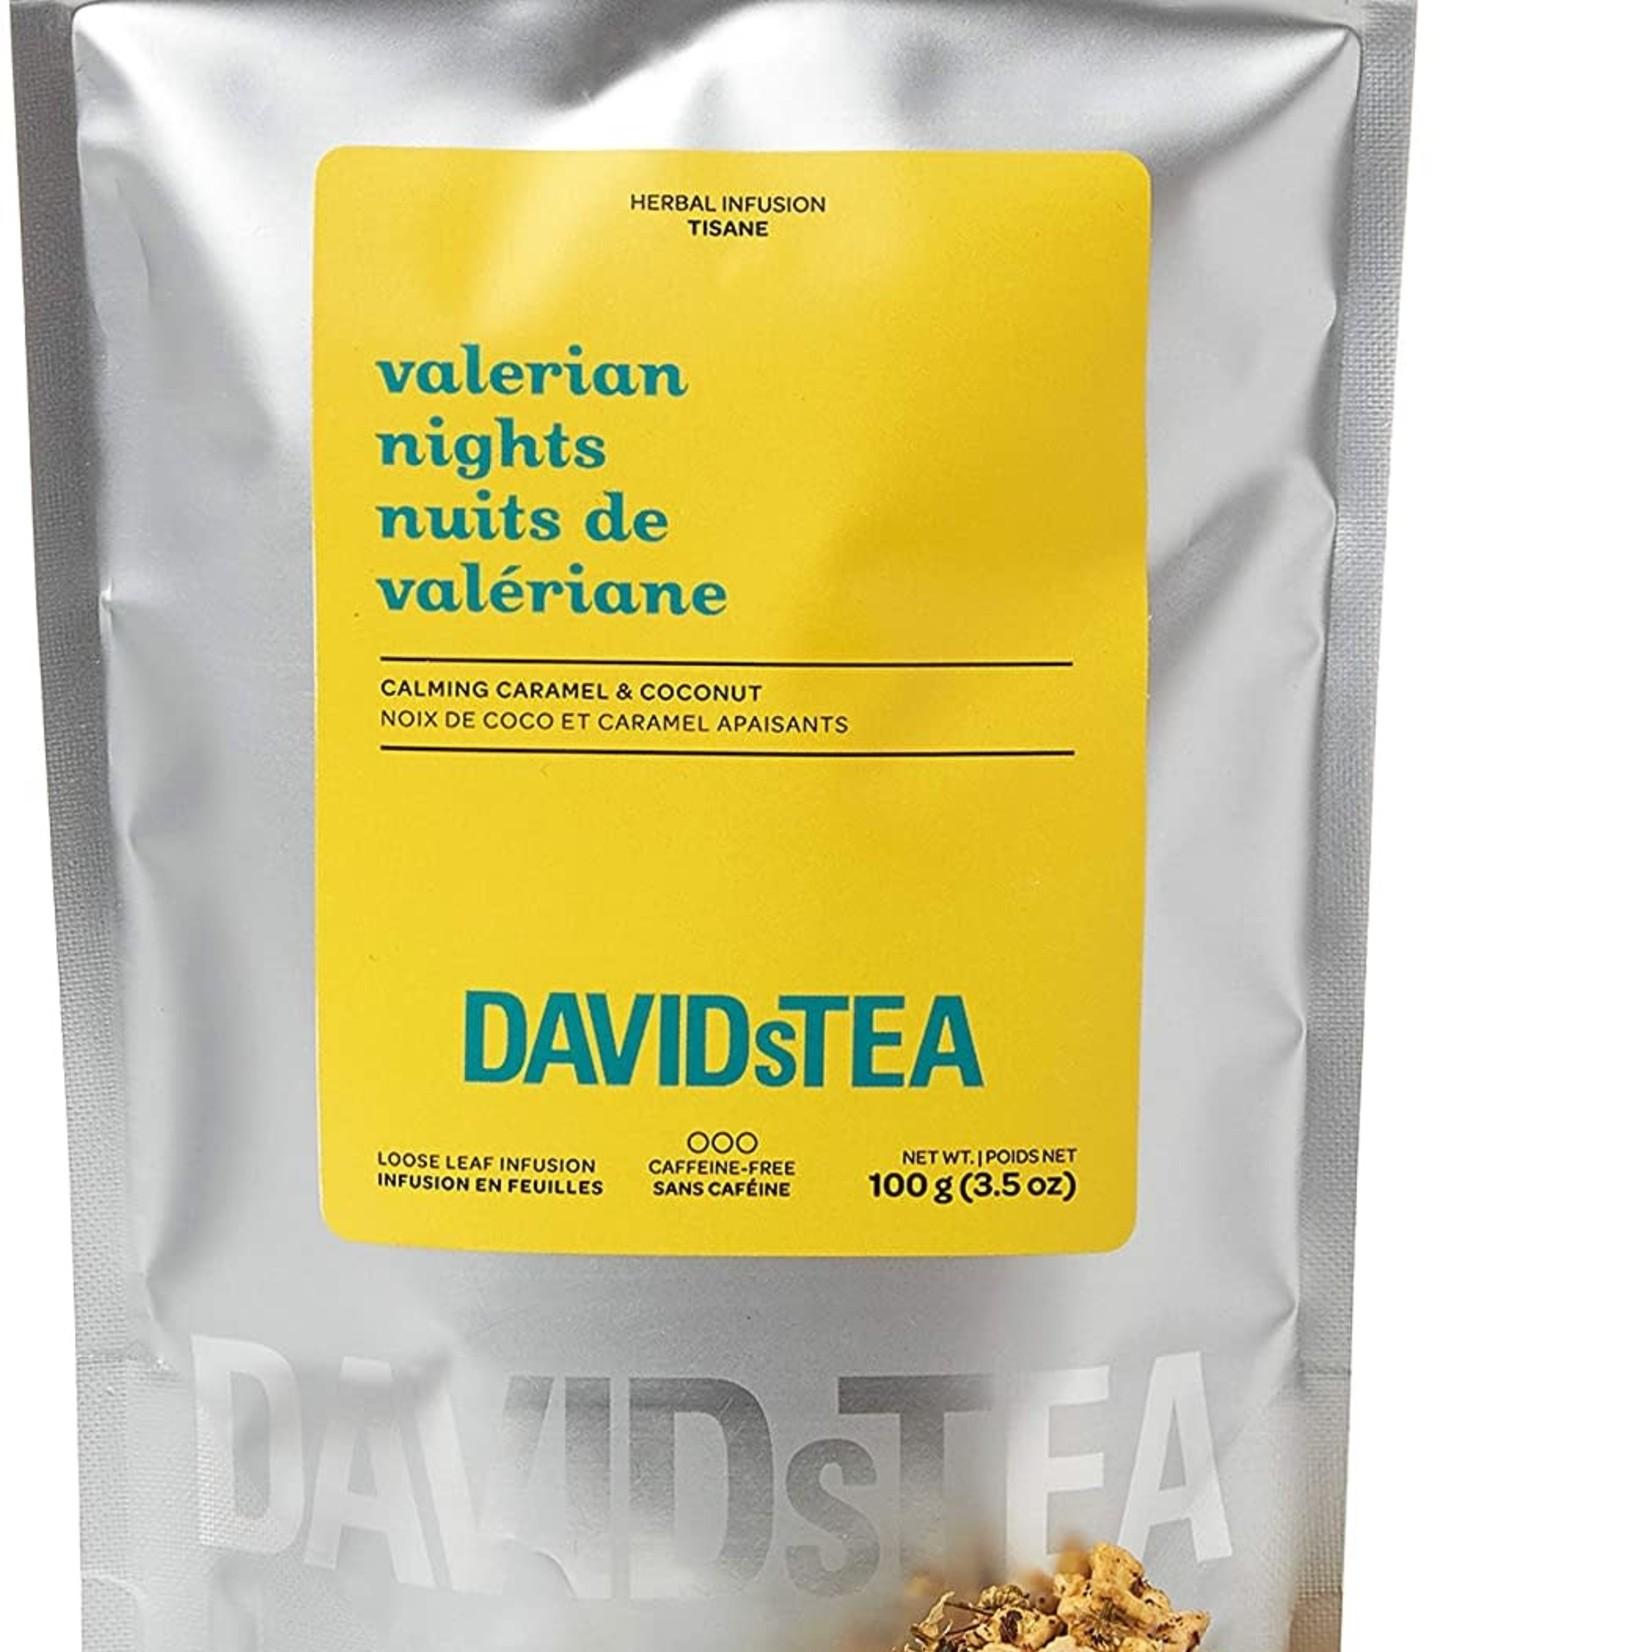 DAVIDsTEA Valerian Nights Loose Leaf Rooibos Tea, Premium Relaxing Sleep Tea with Valerian Root, Coconut and Caramel, 100g